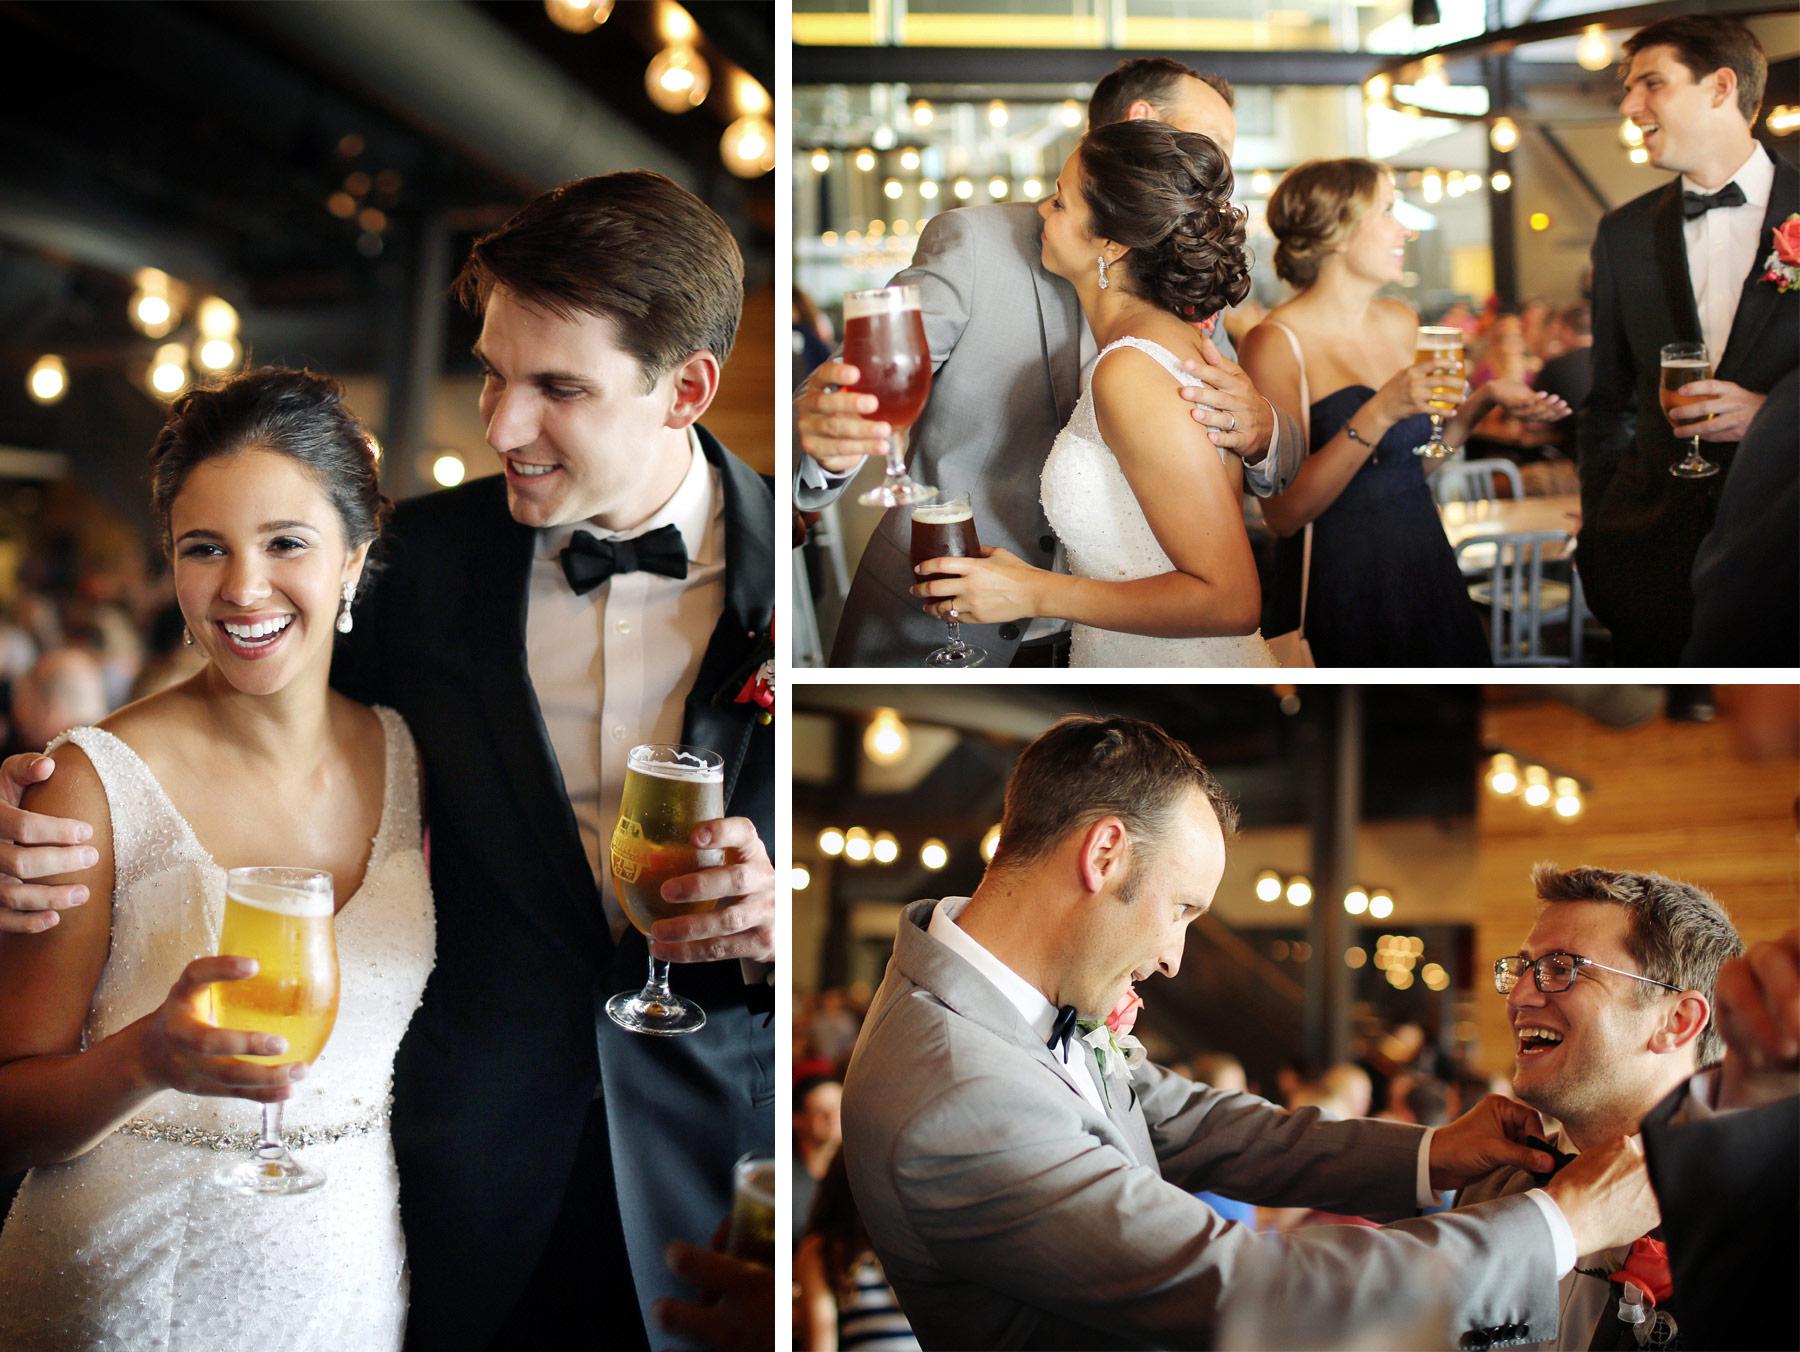 12-Minneapolis-Minnesota-Wedding-Photography-by-Vick-Photography-Wedding-Party-Group-Downtown-Beer-Lalu-&-John.jpg